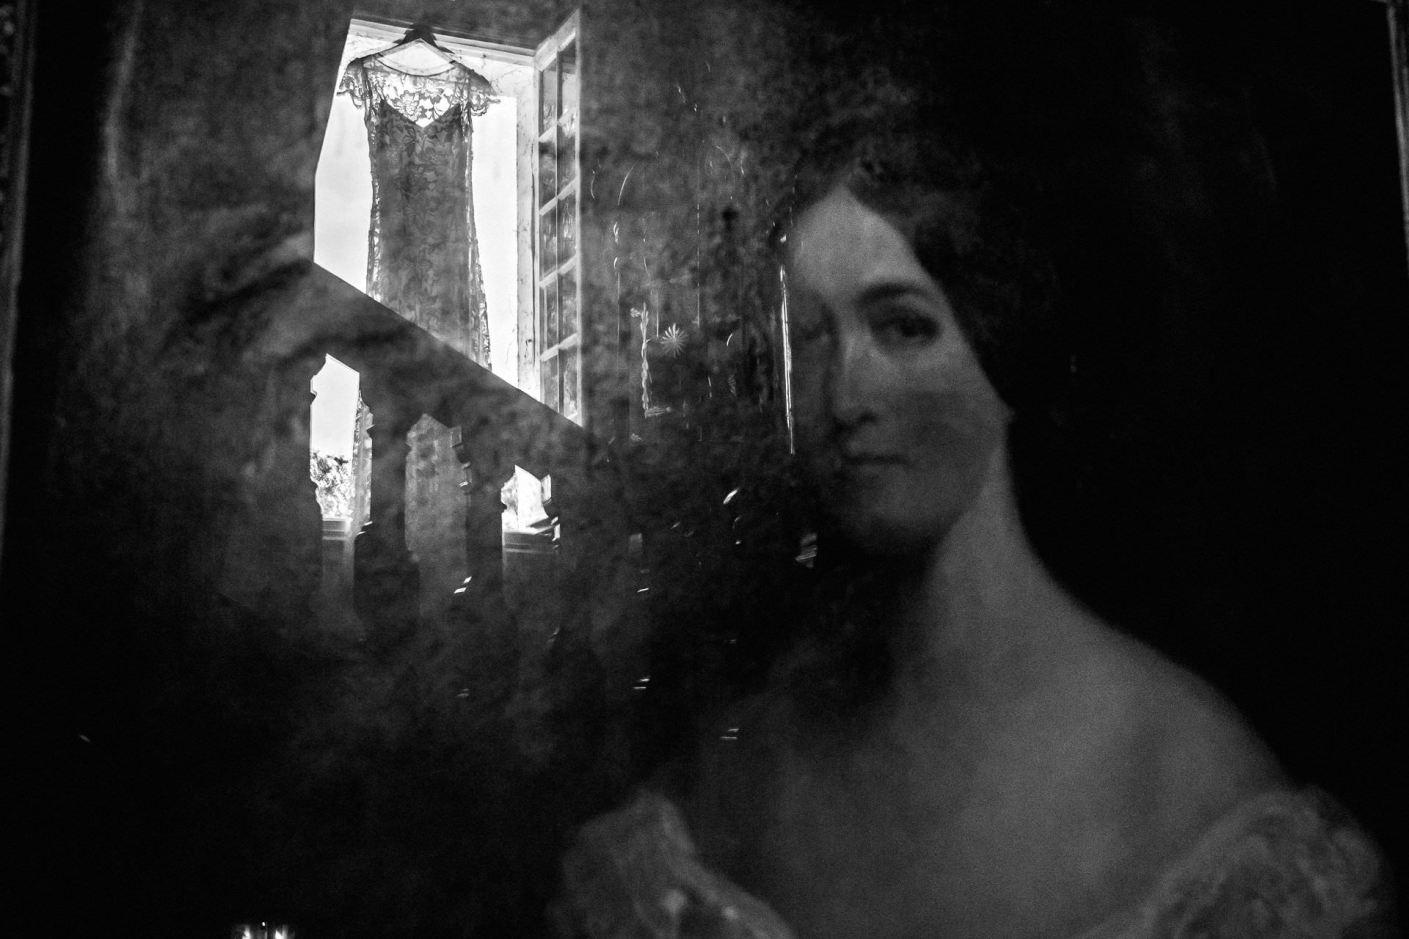 reflection photo of wedding dress